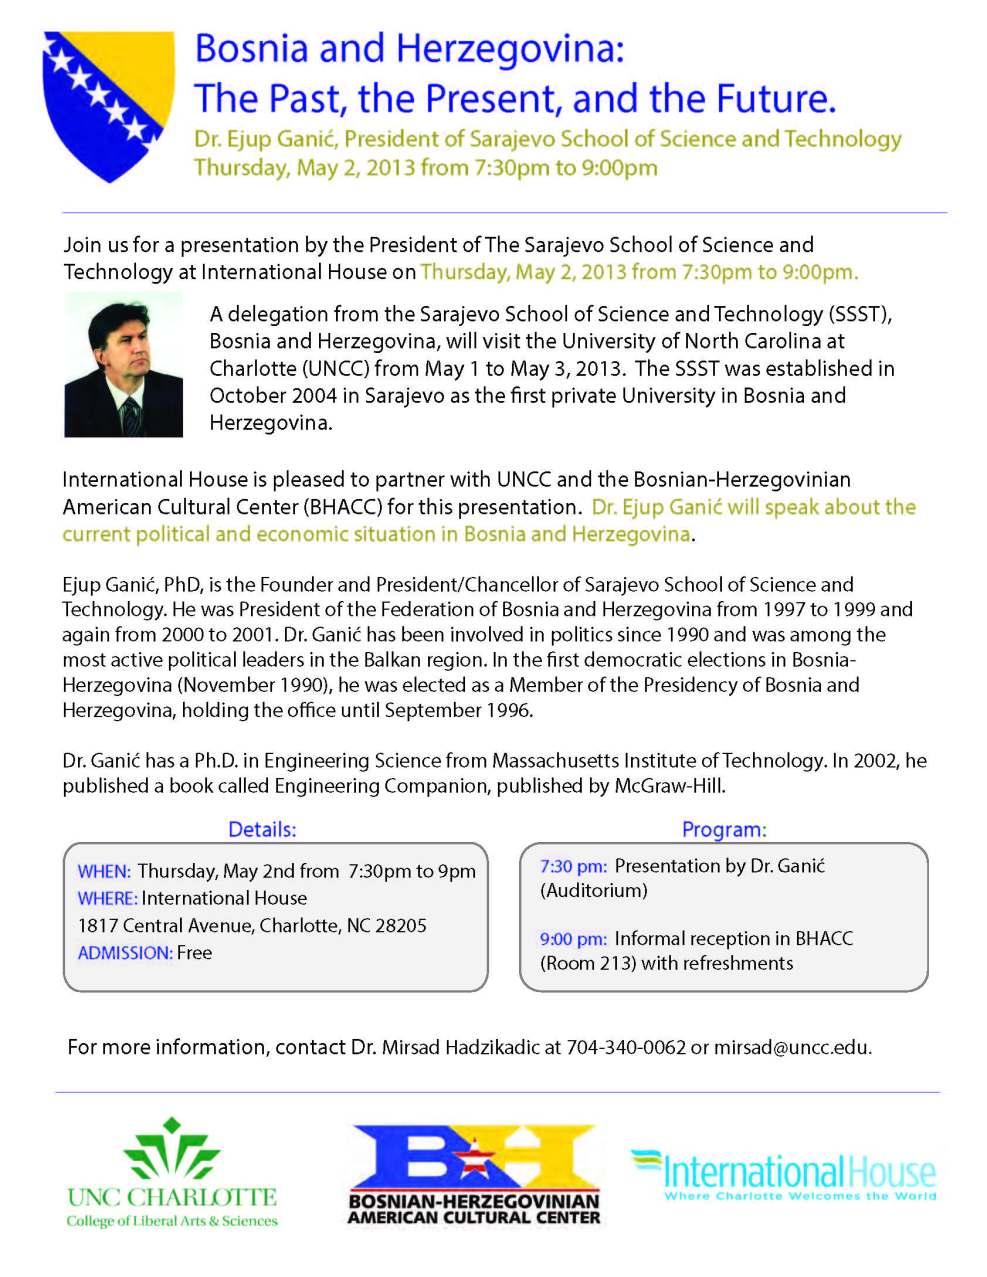 UNCC-Bonsian Event-May 2-jpg